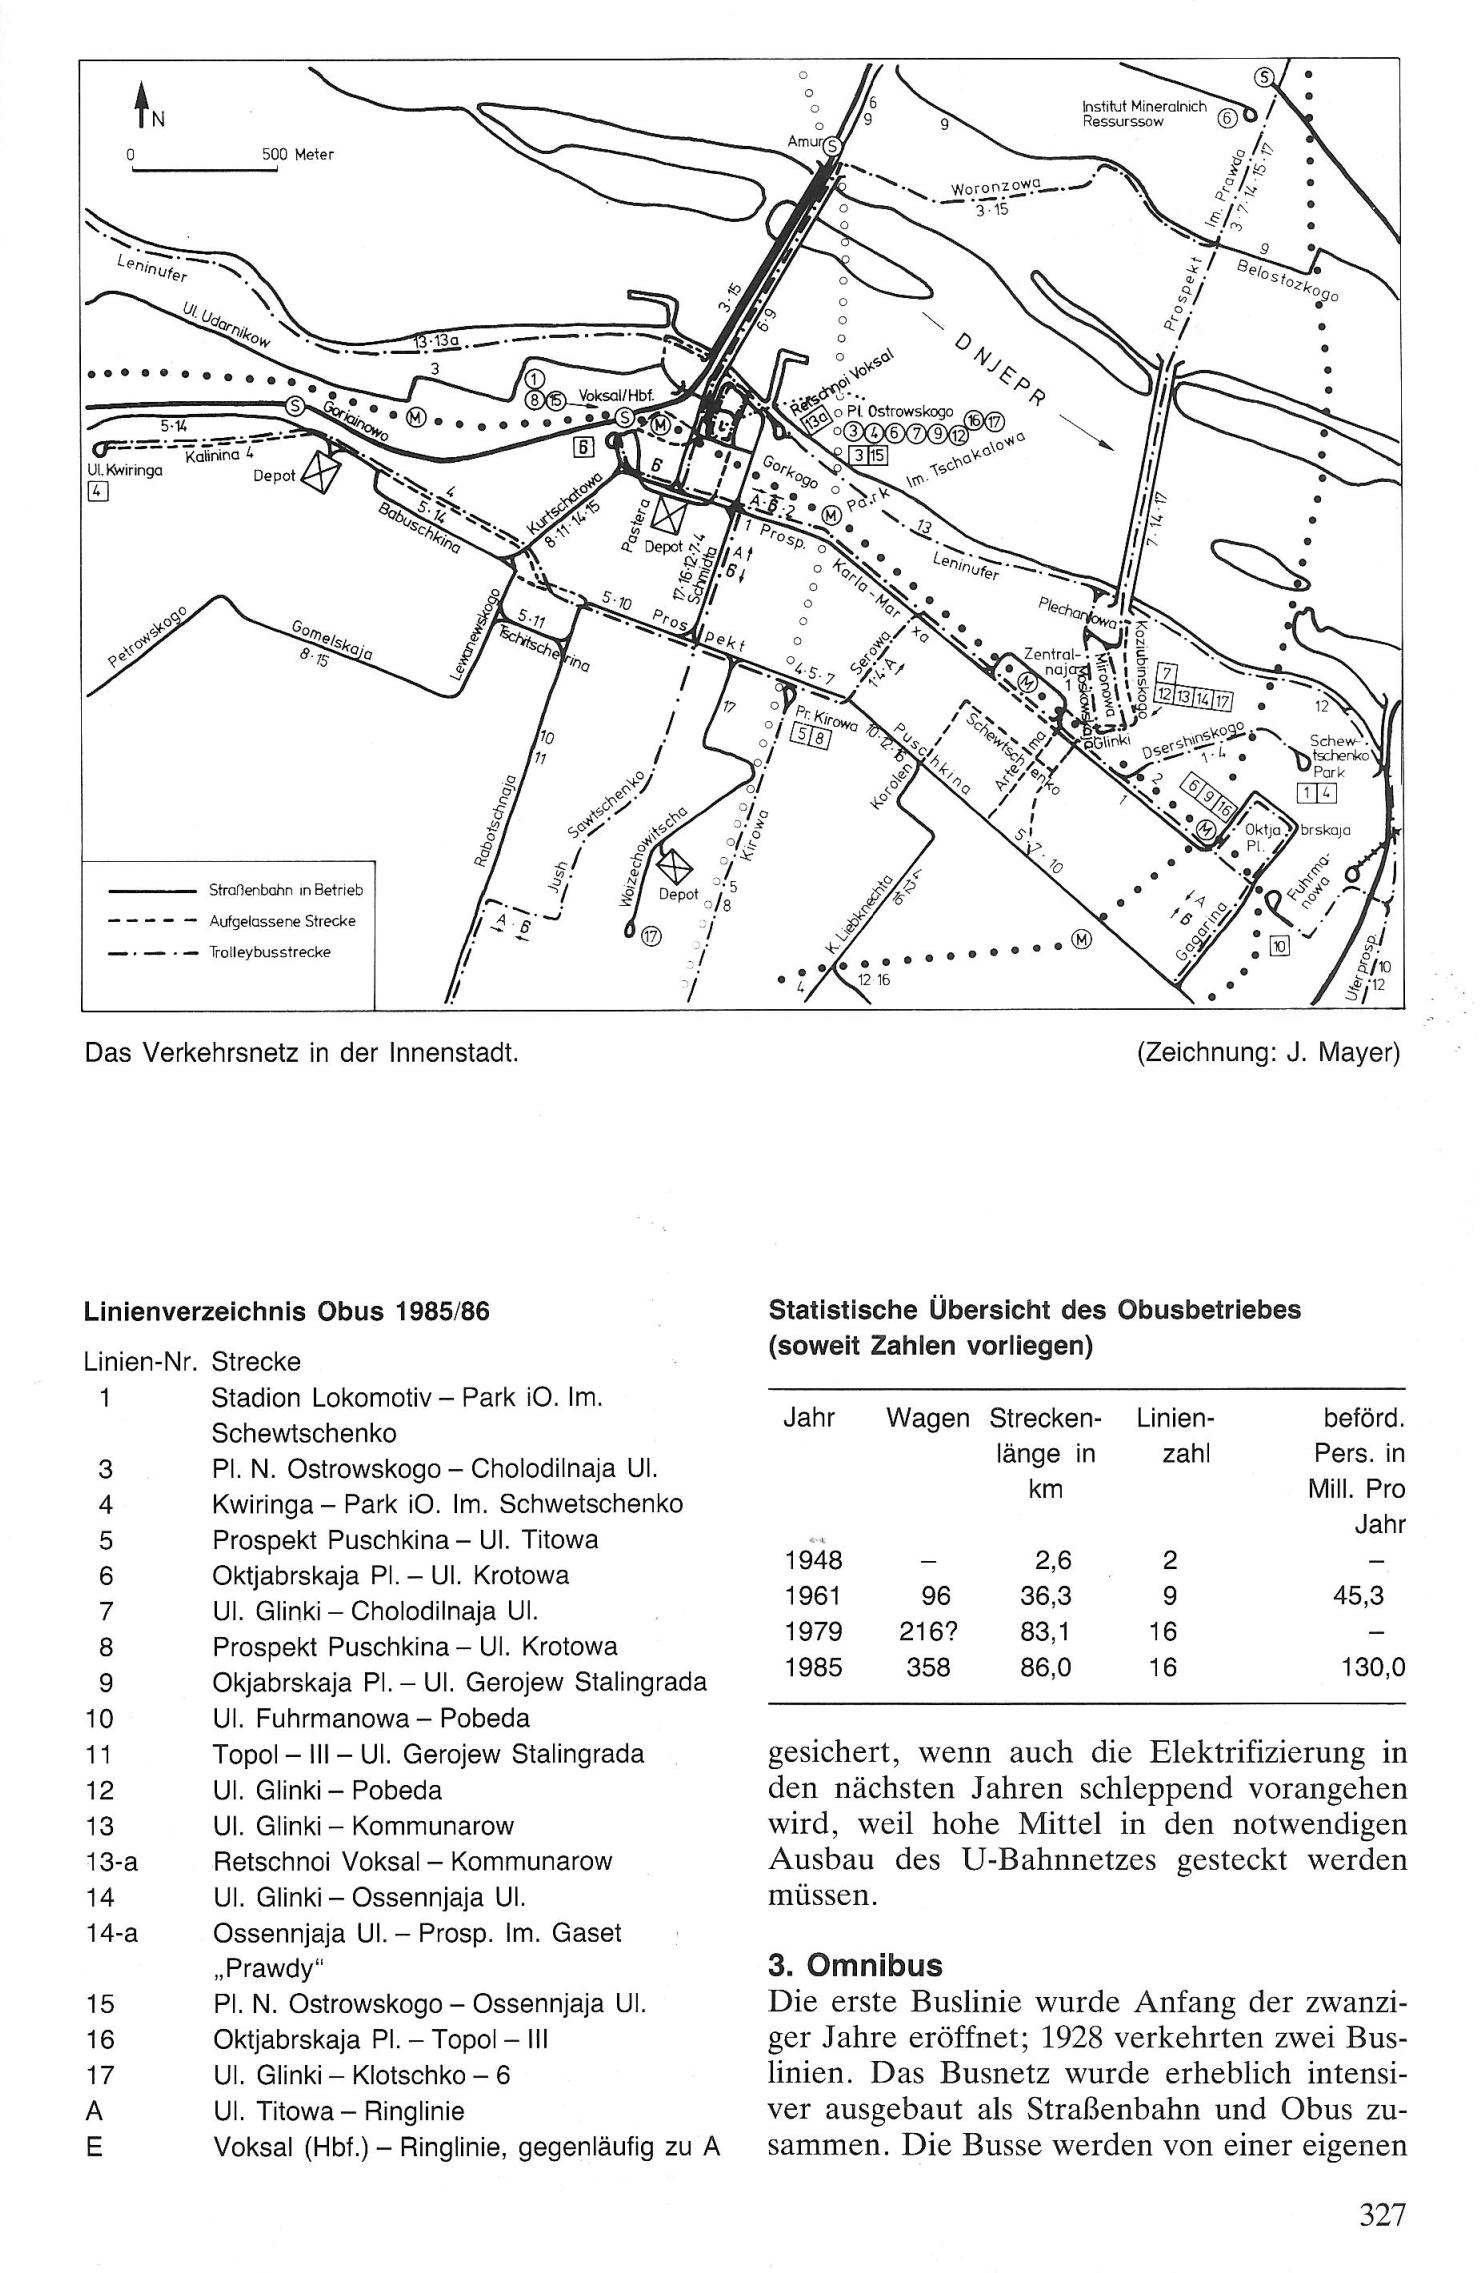 Сканы журнала Strassenbahn Magazin со статьей об электротранспорте Днепра